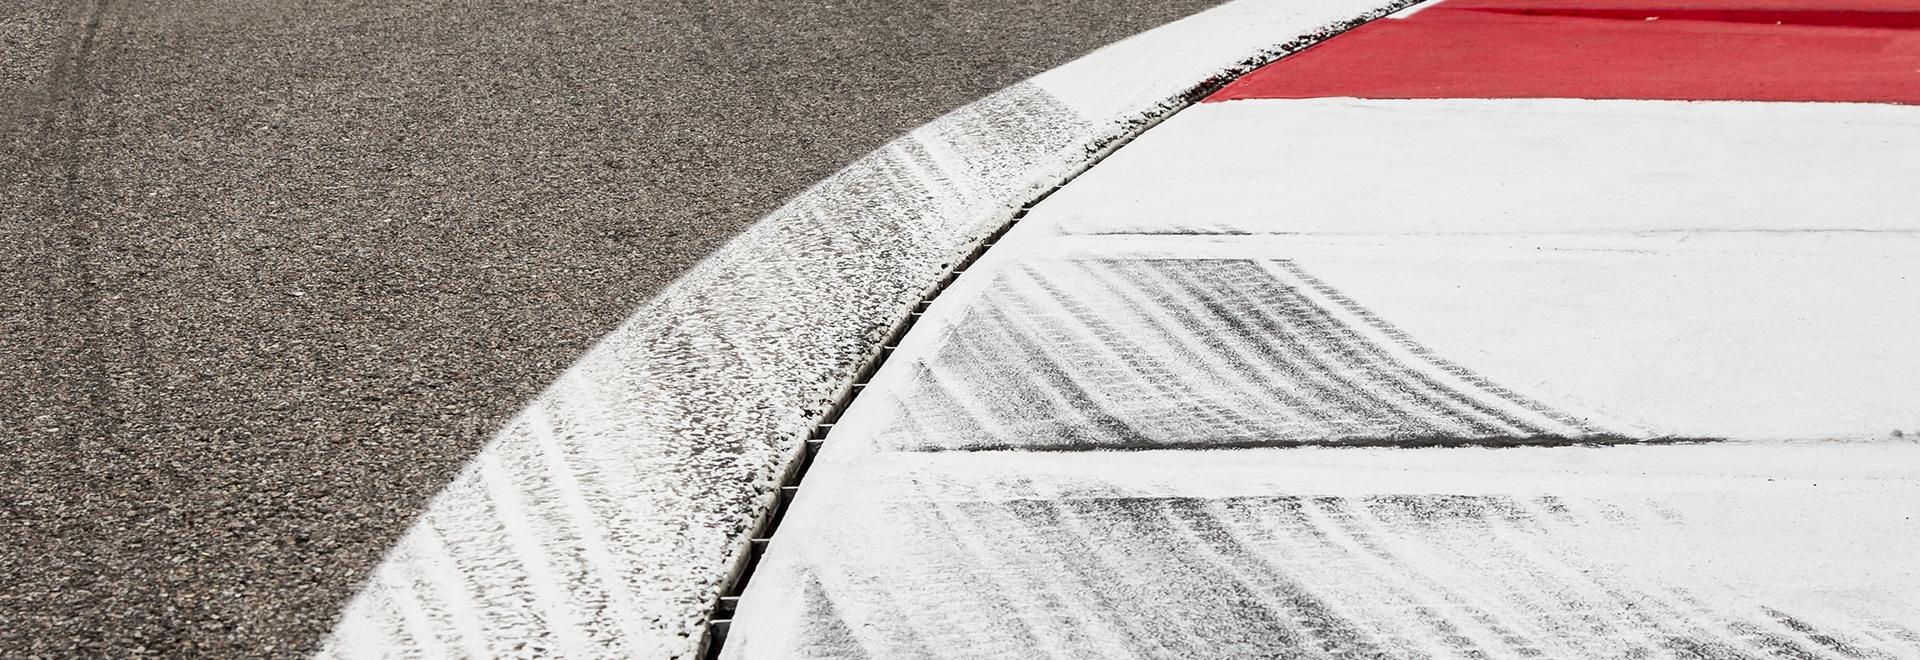 F3 - Stag. 2019 Ep. Prove Libere - GP Abu Dhabi